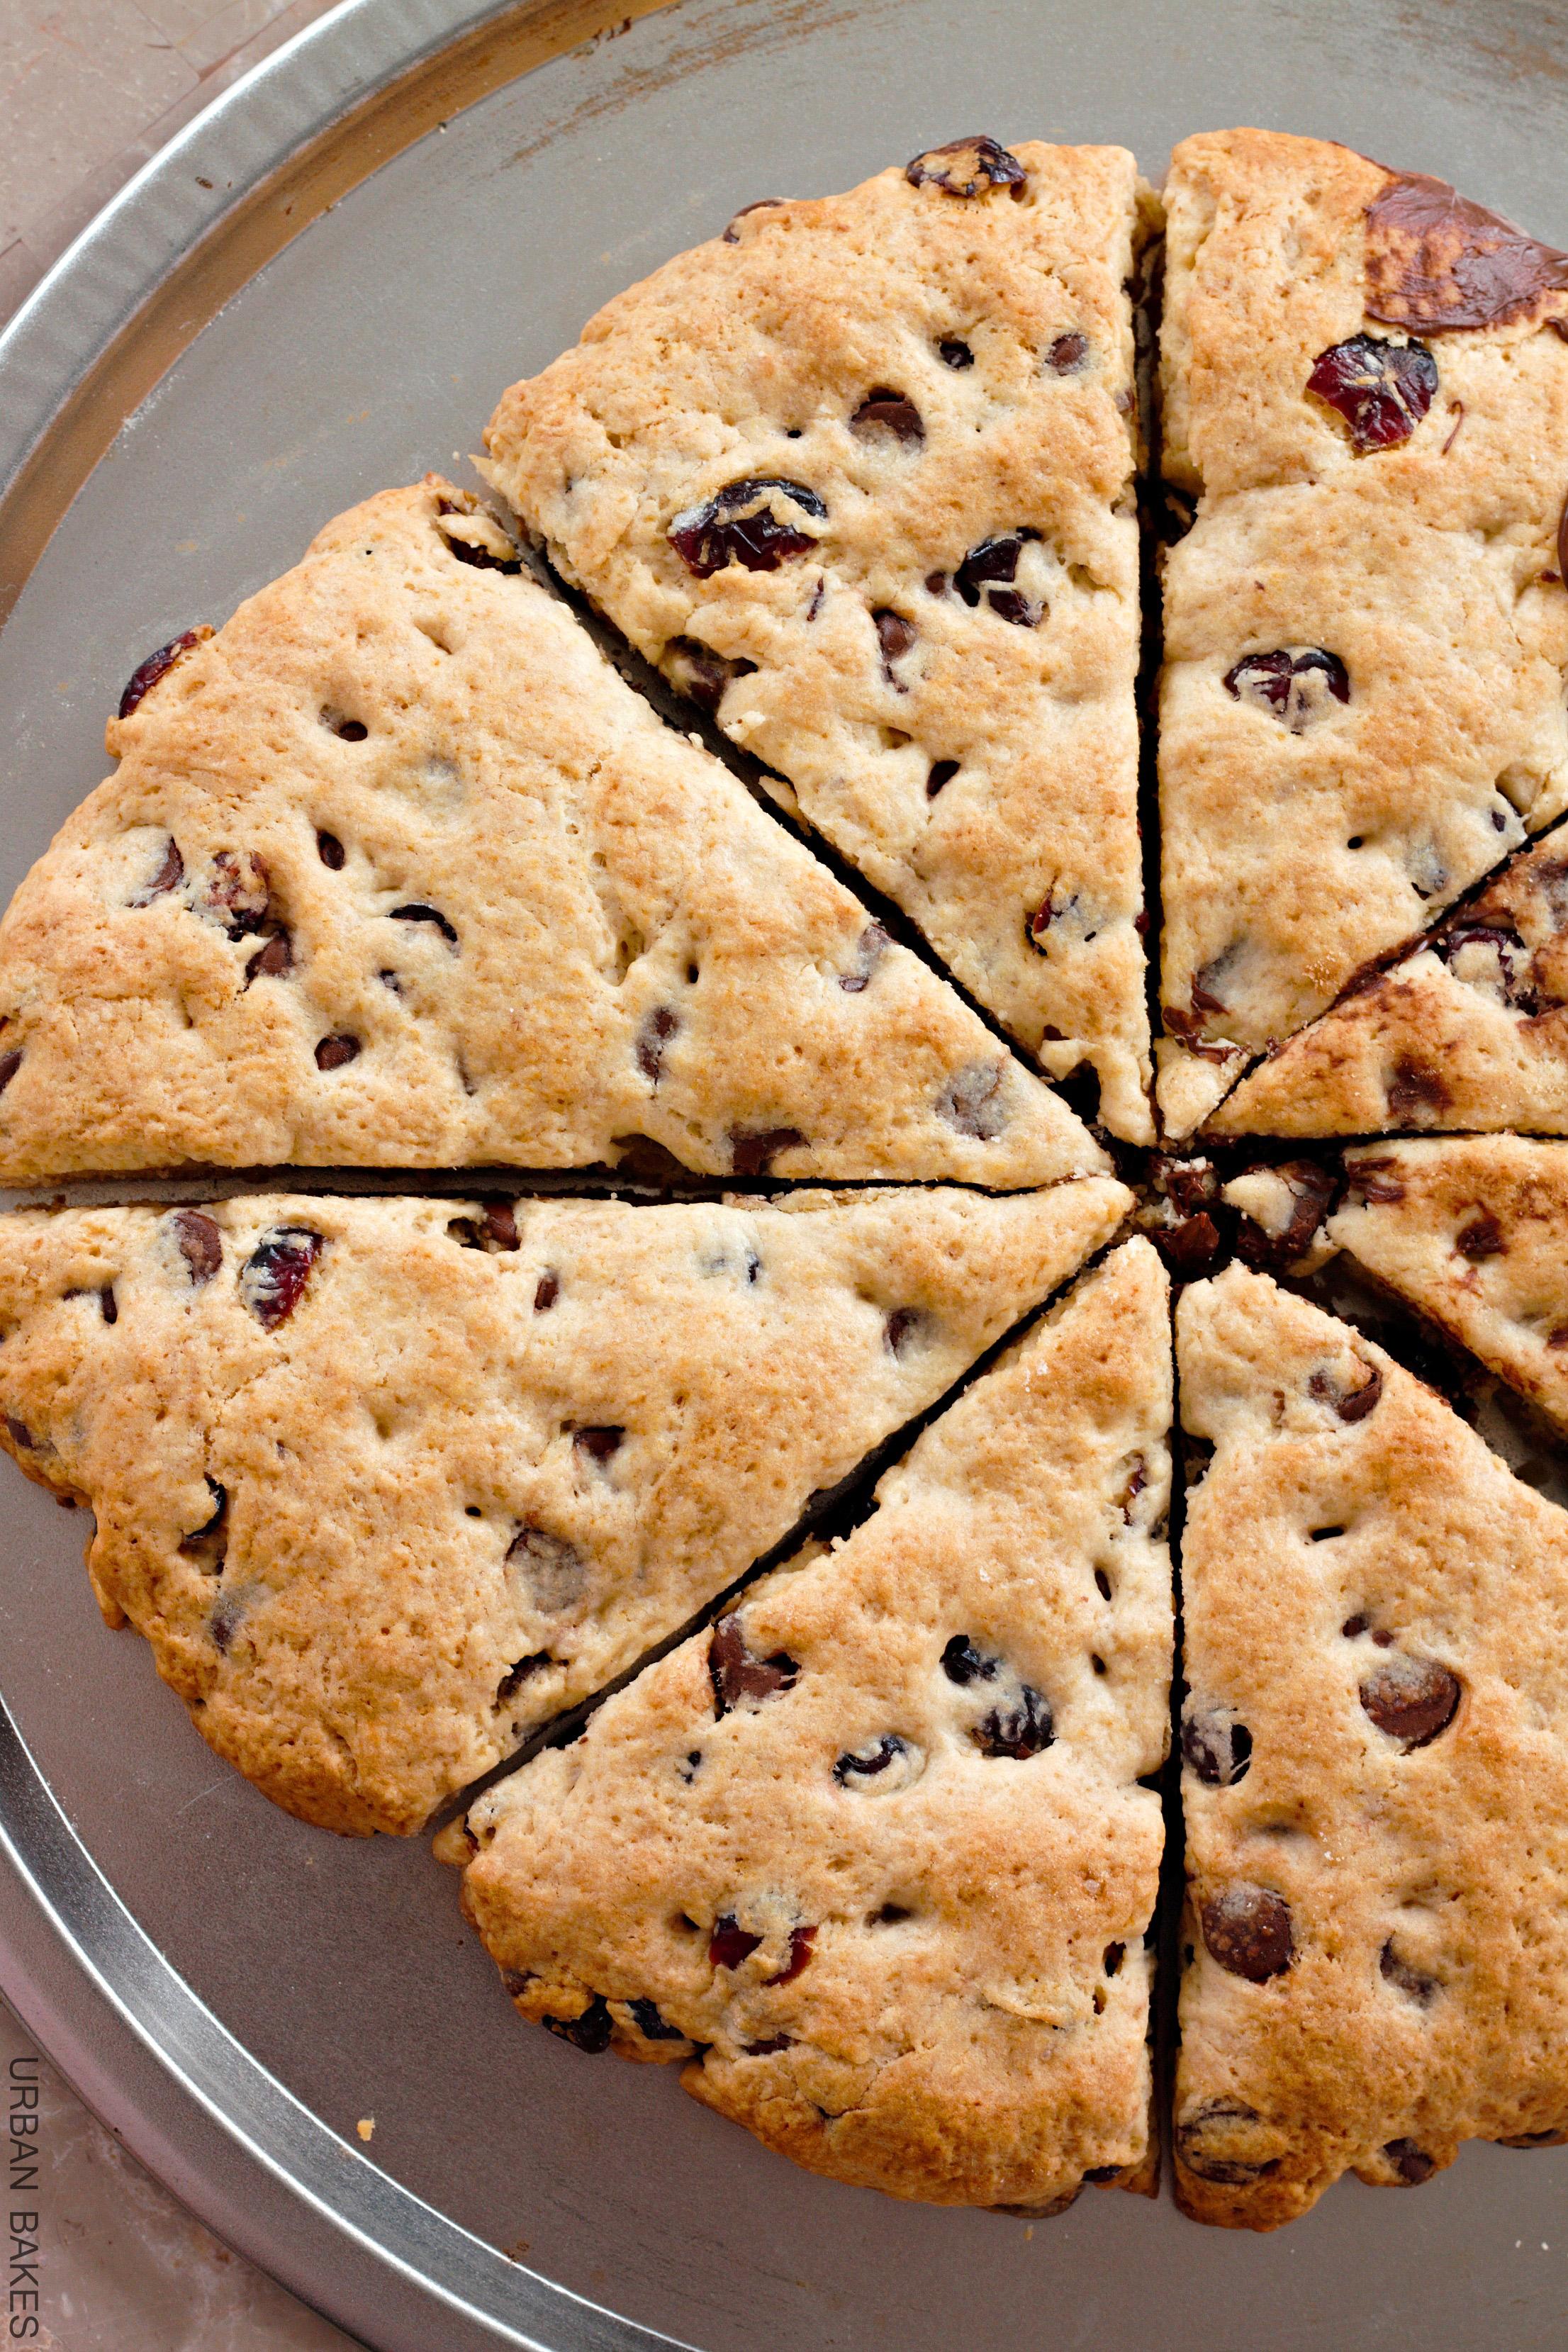 URBAN BAKES - Cherry-Chocolate Chip Scones - URBAN BAKES